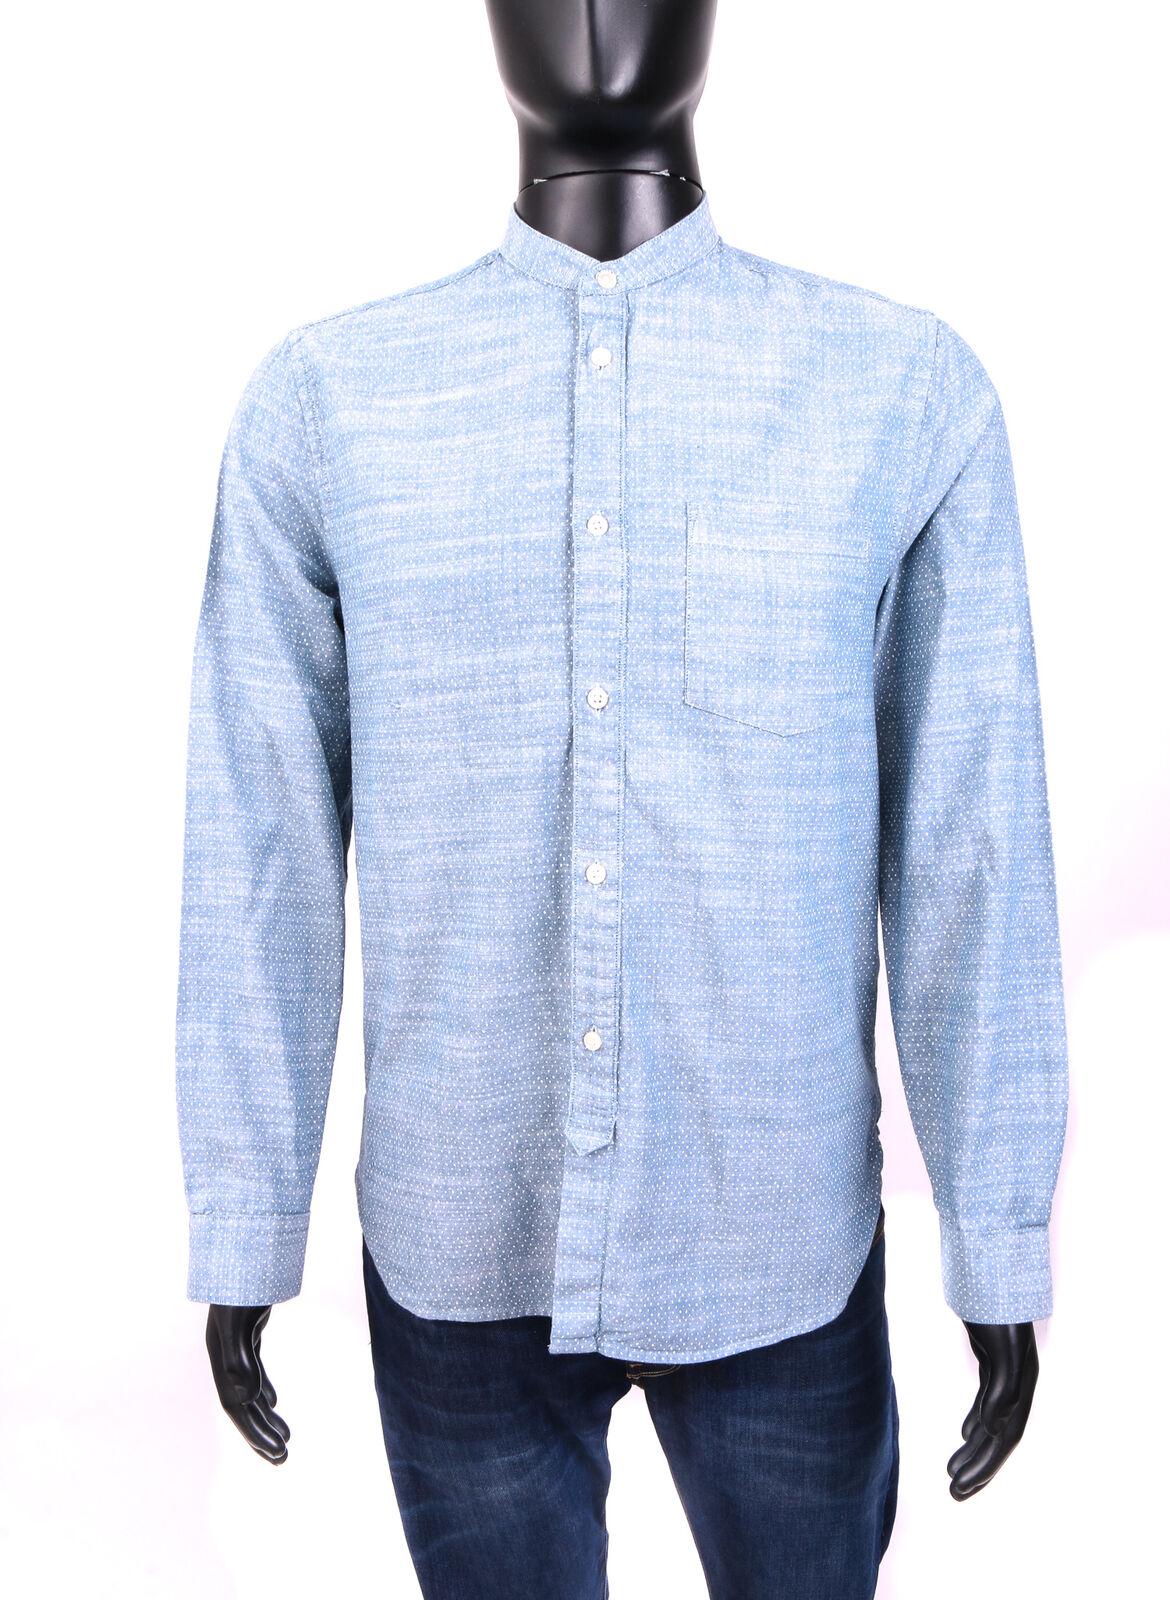 3fd2e7b4 H&M Mens Shirt Tailored Cotton M Pattern size oqubsk2284-Casual Shirts &  Tops